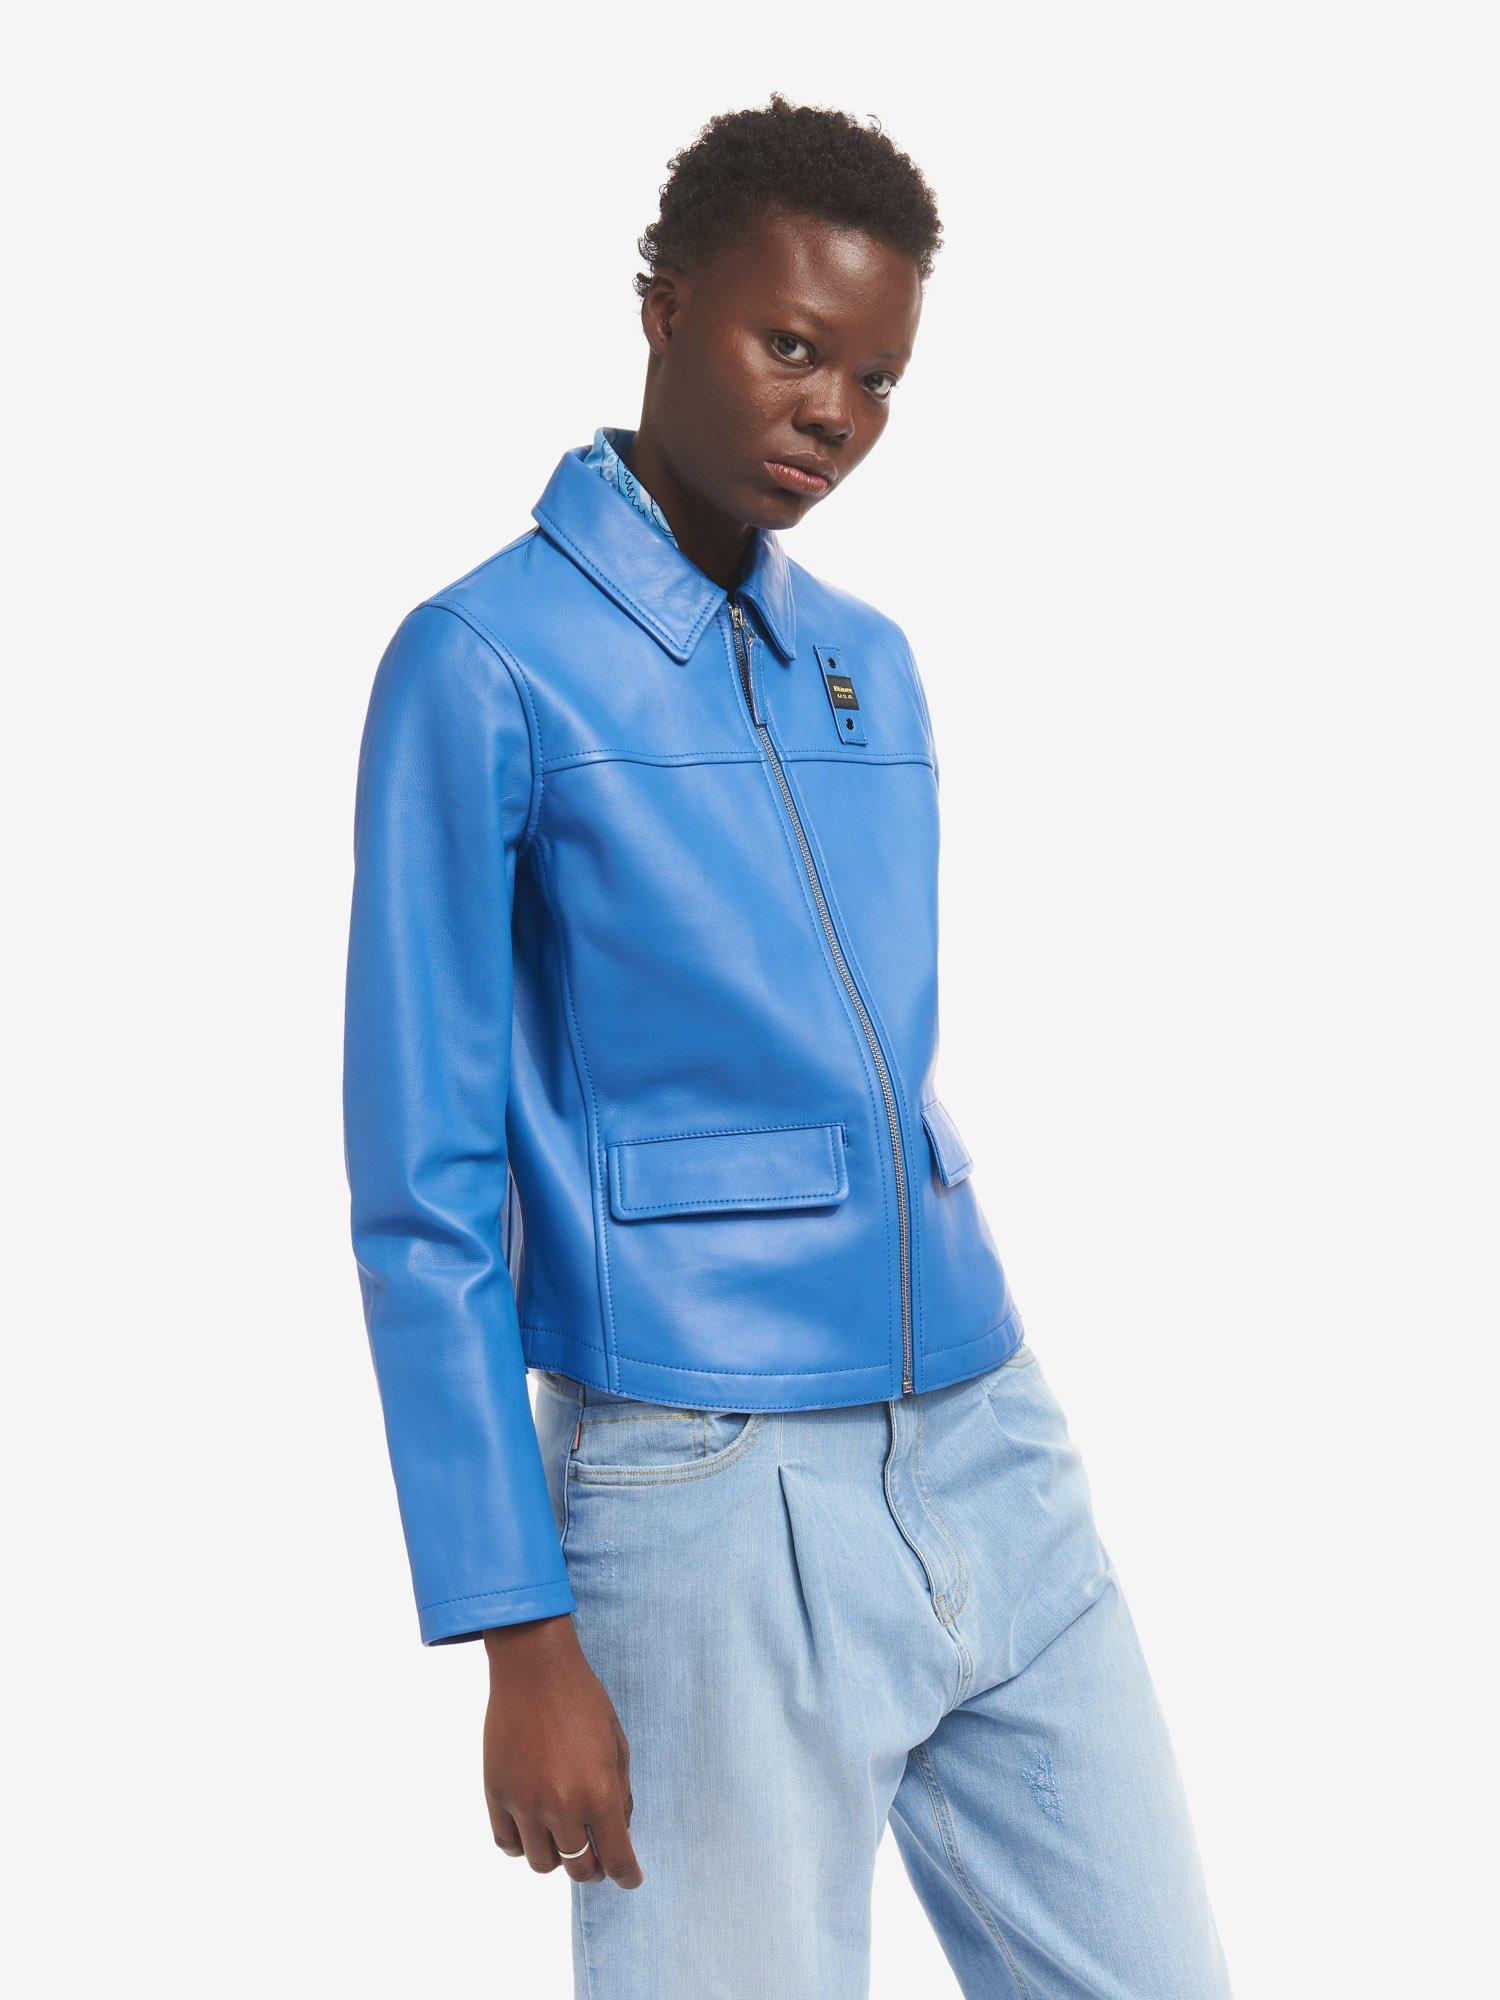 Blauer - SHERRY UNLINED LEATHER JACKET - Light Sapphire Blue - Blauer